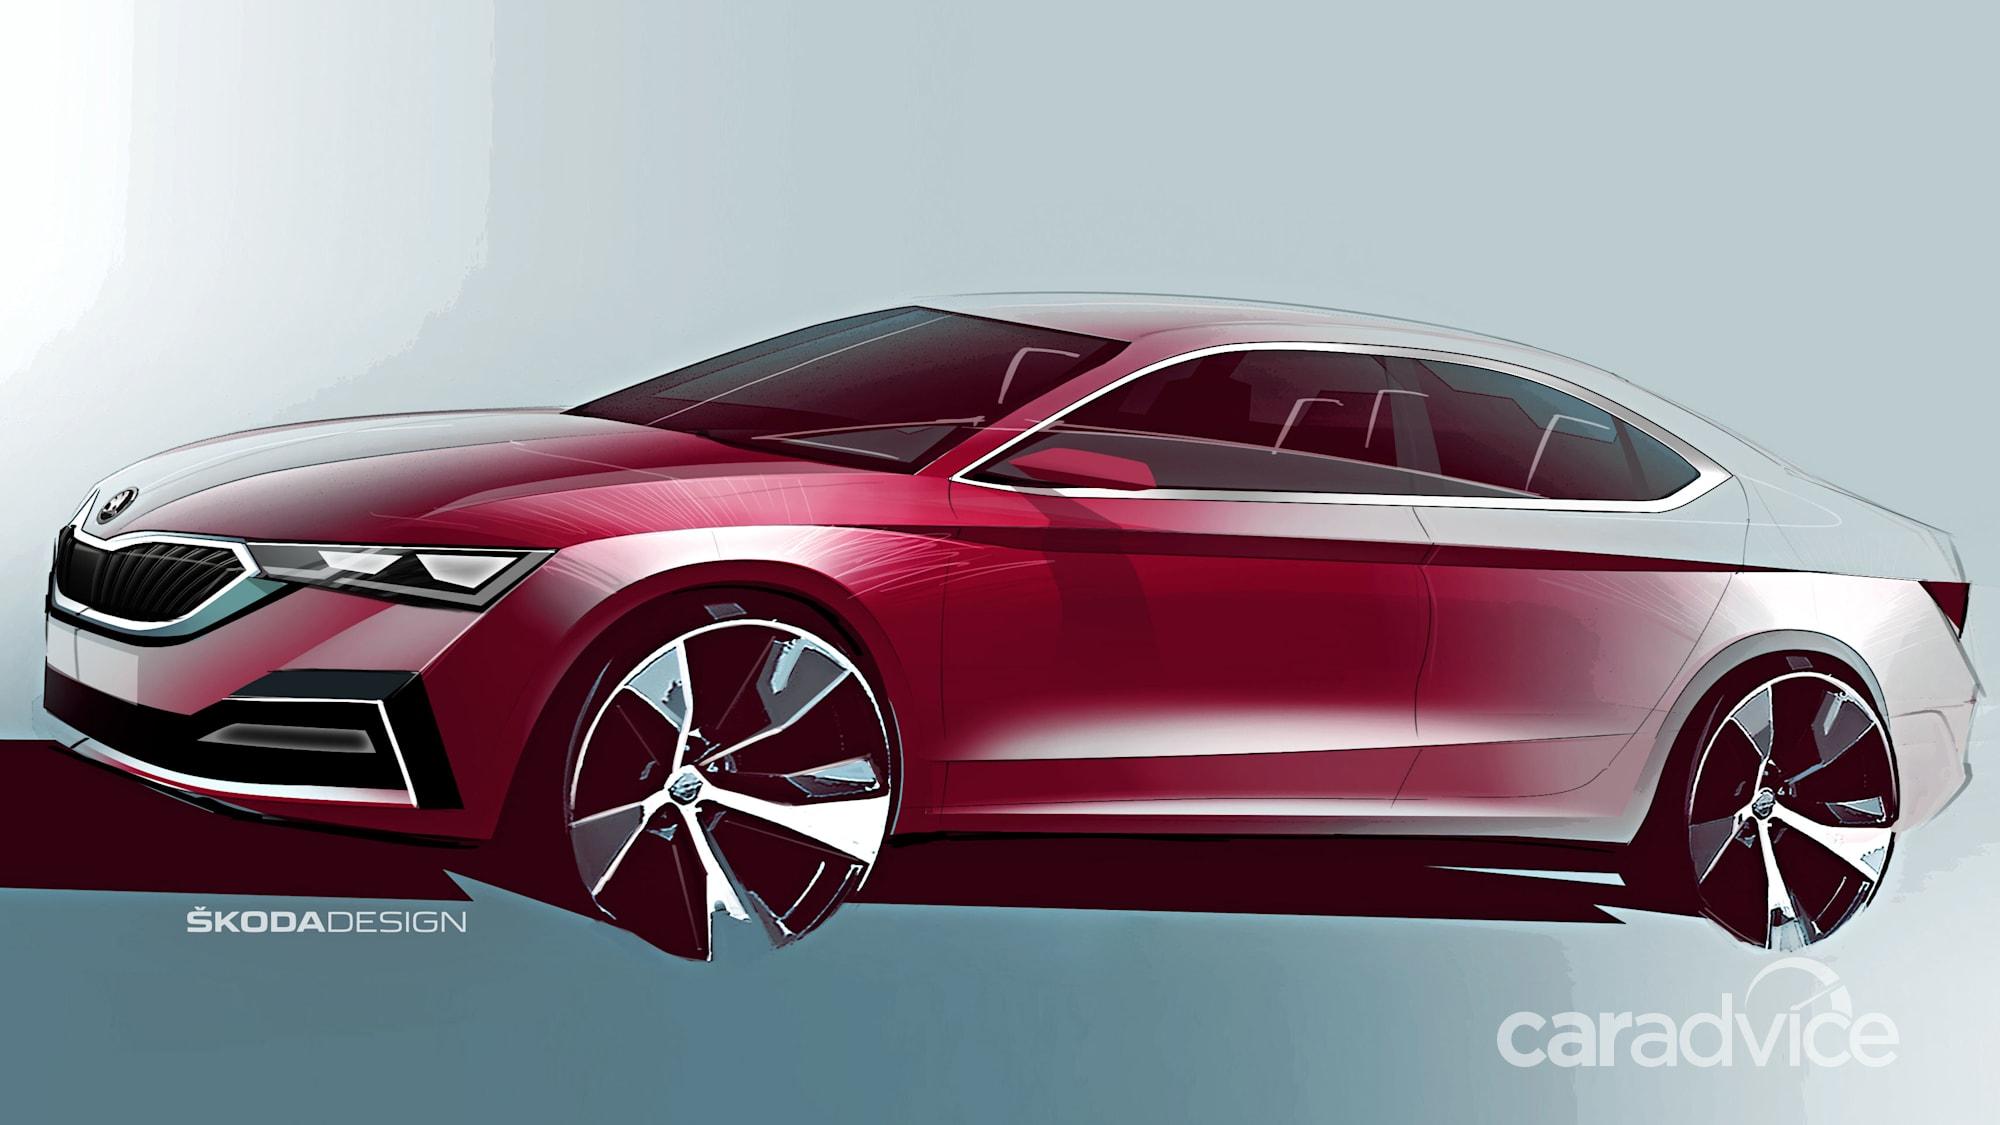 2021 Skoda Octavia sketched | CarAdvice